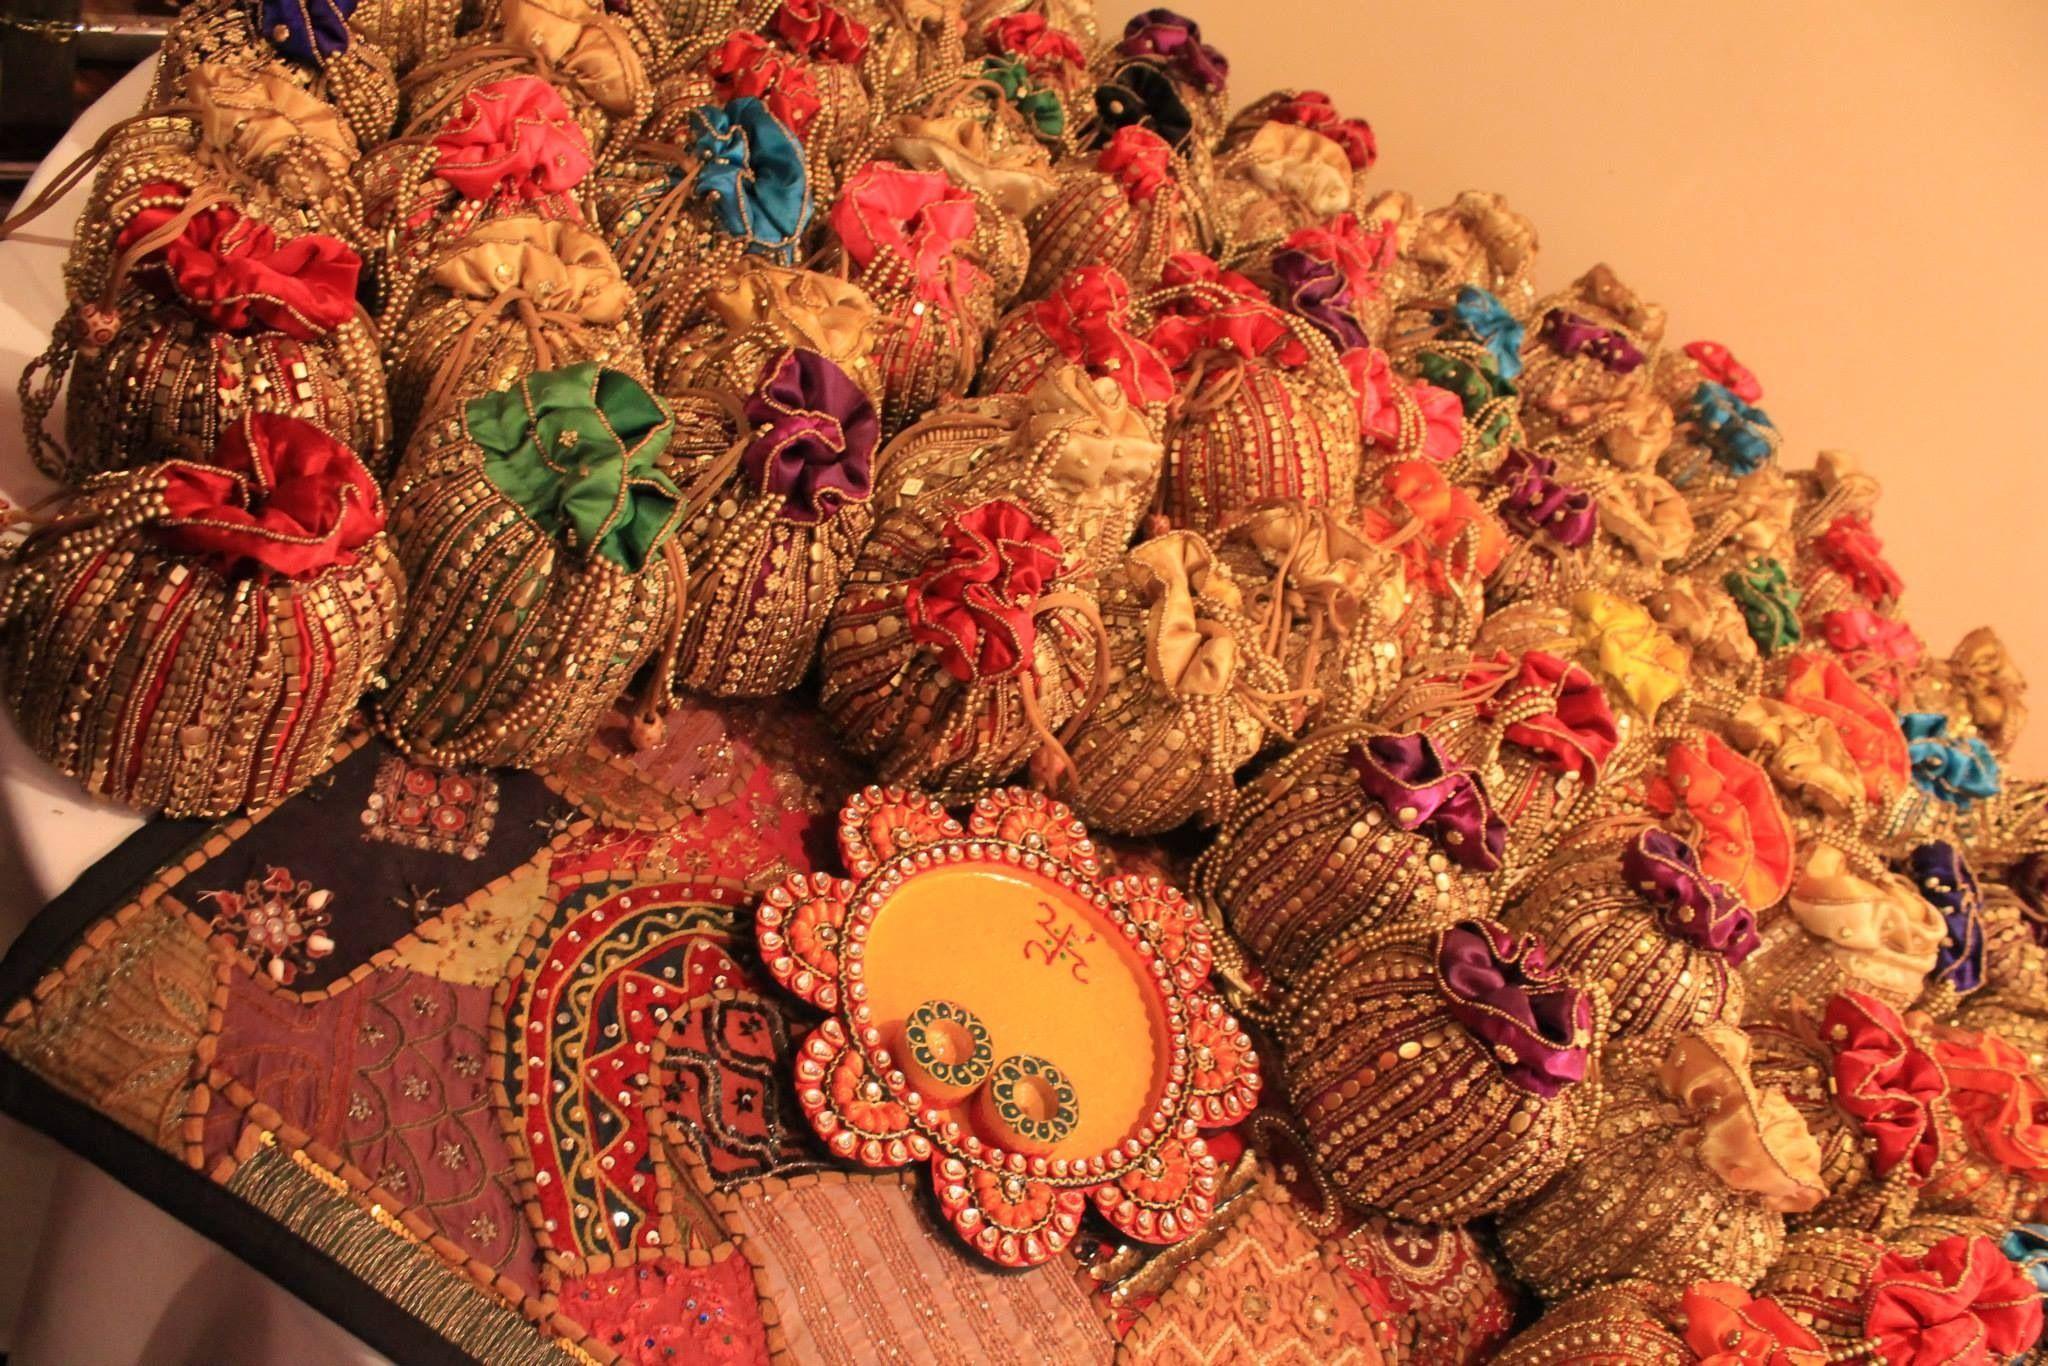 mehendi favors and bags.jpg Indian wedding favors